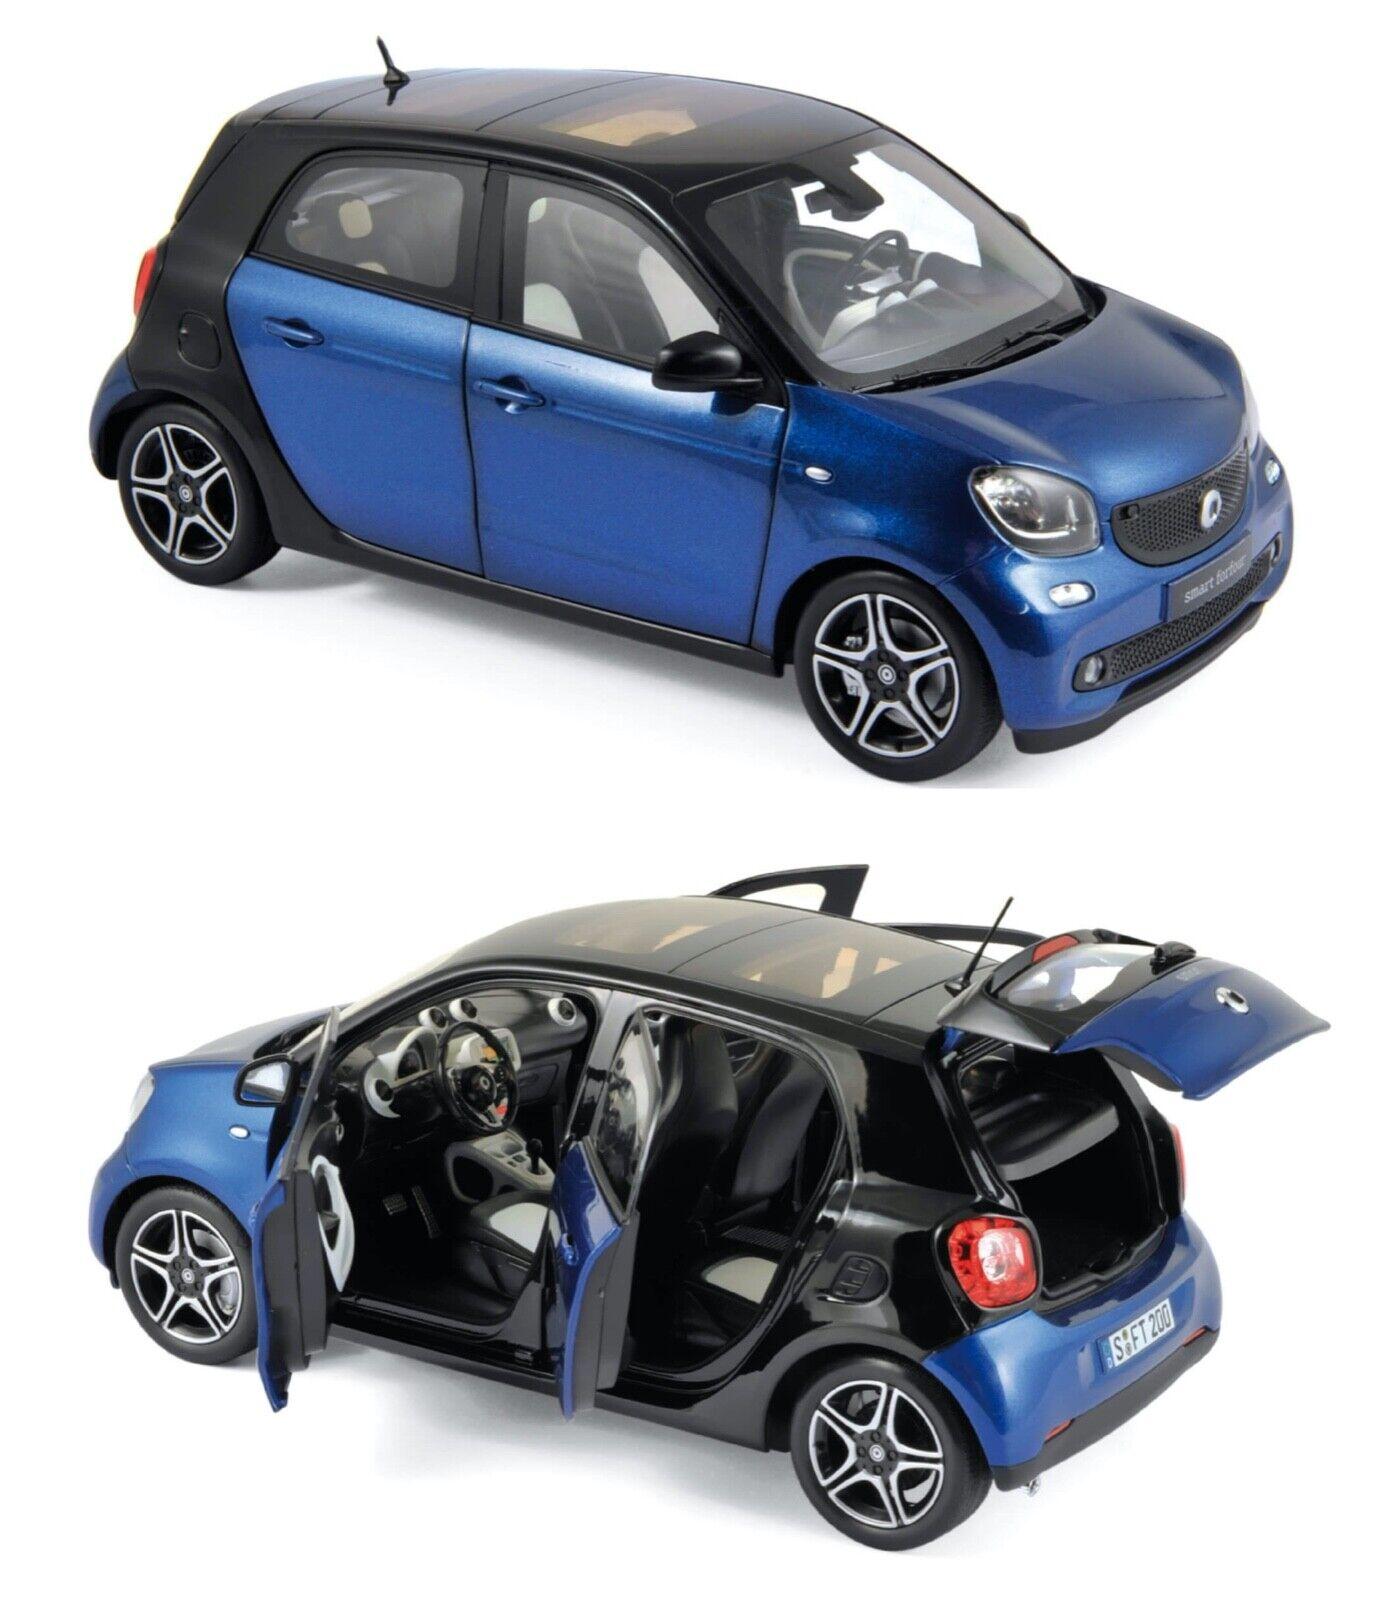 1 18 norev smart forfour 2015 schwarz Blau  neuf boite origine livraison gratuite